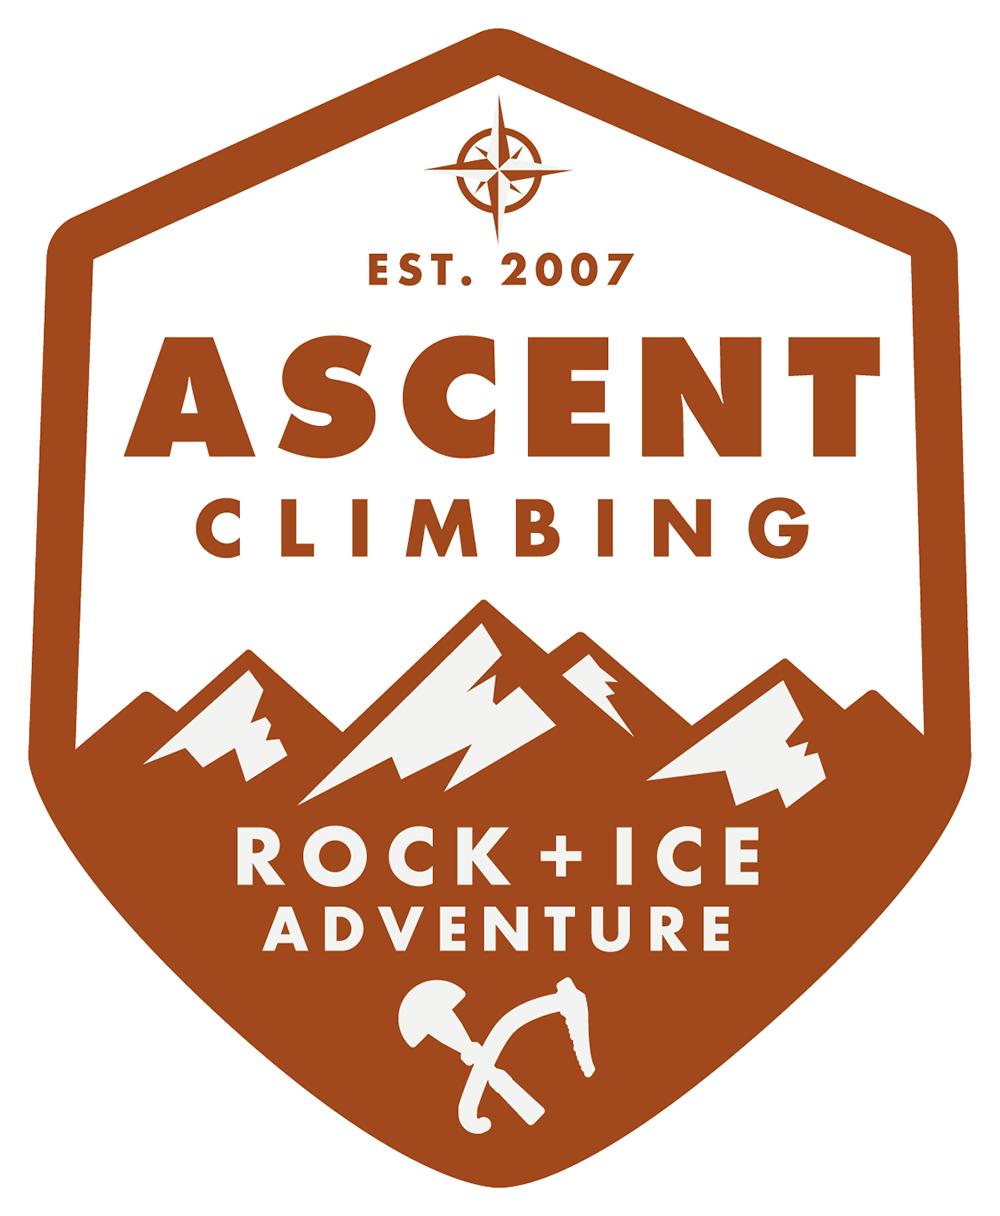 Amga Climbing Wall Instructor Cwi Ascent Climbing